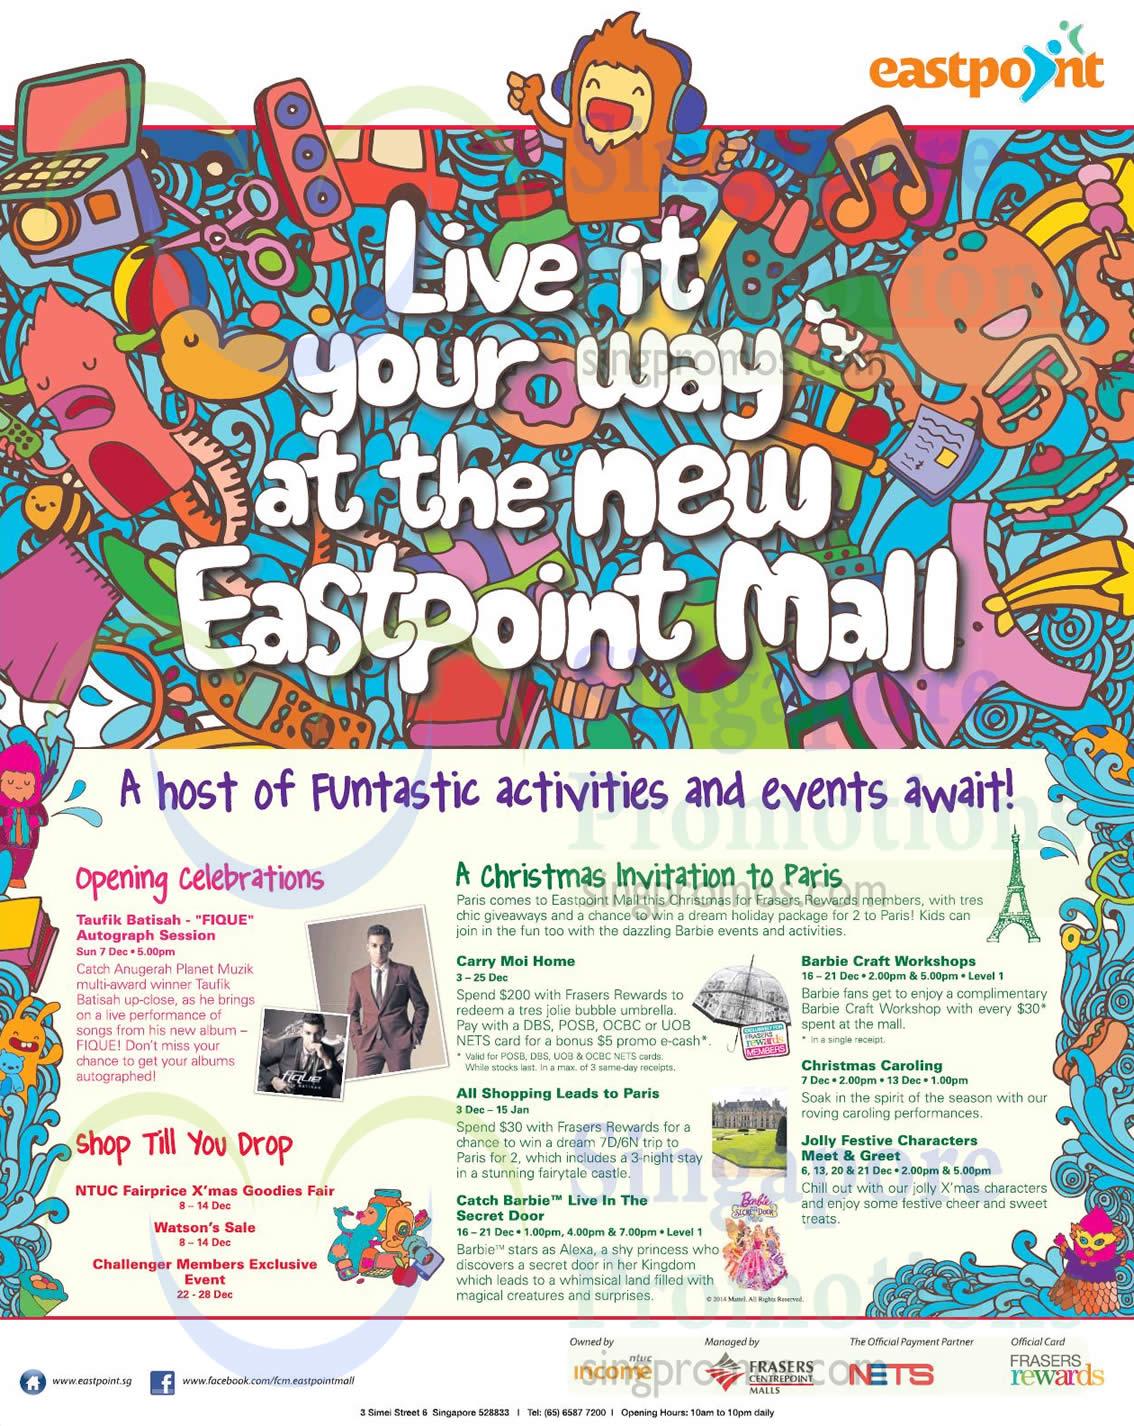 Eastpoint 5 Dec 2014